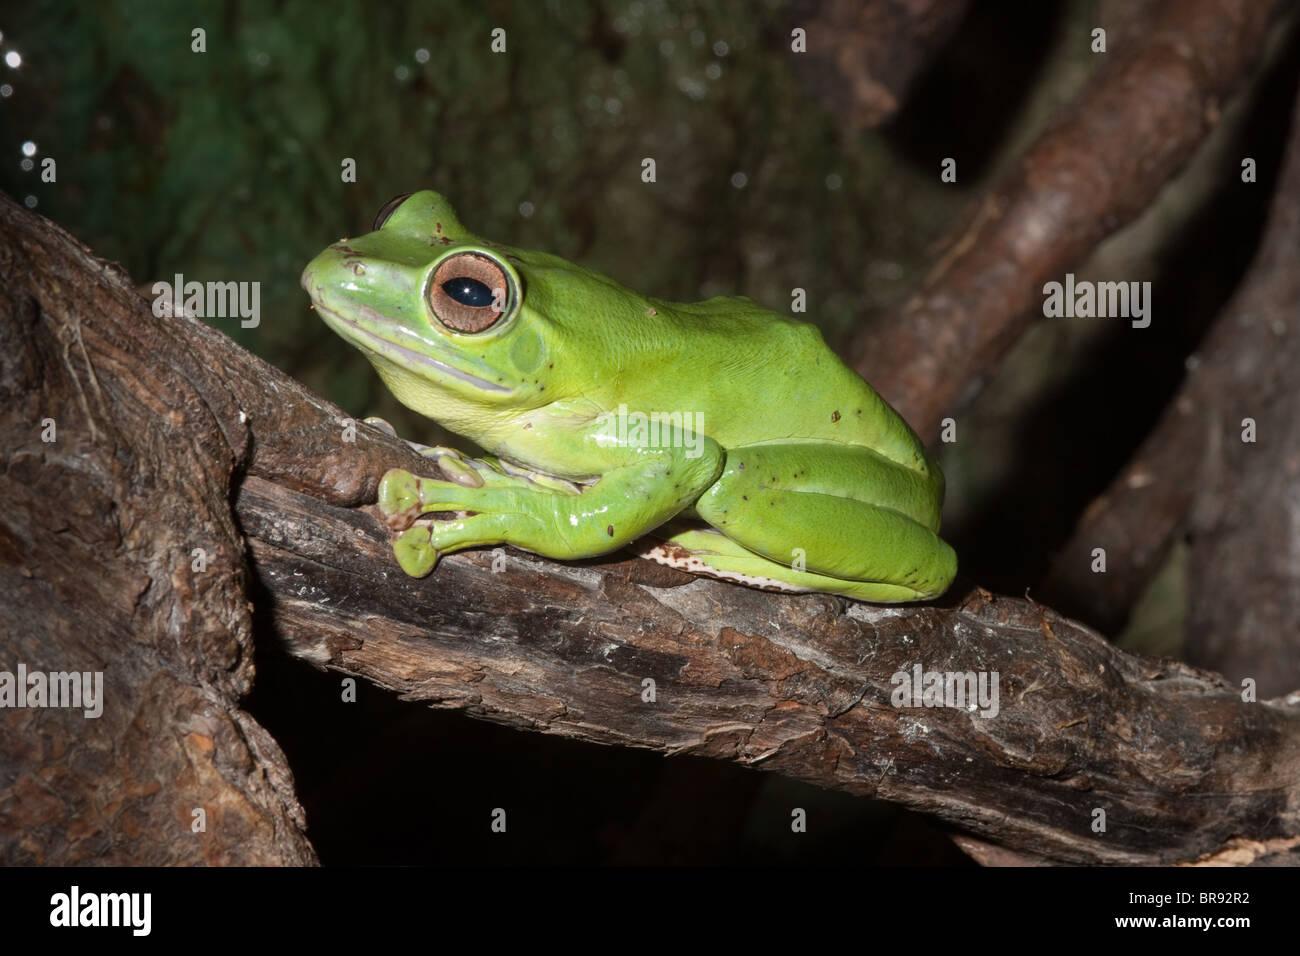 Chinese Gliding Frog (Polypedates dennysi) Stock Photo